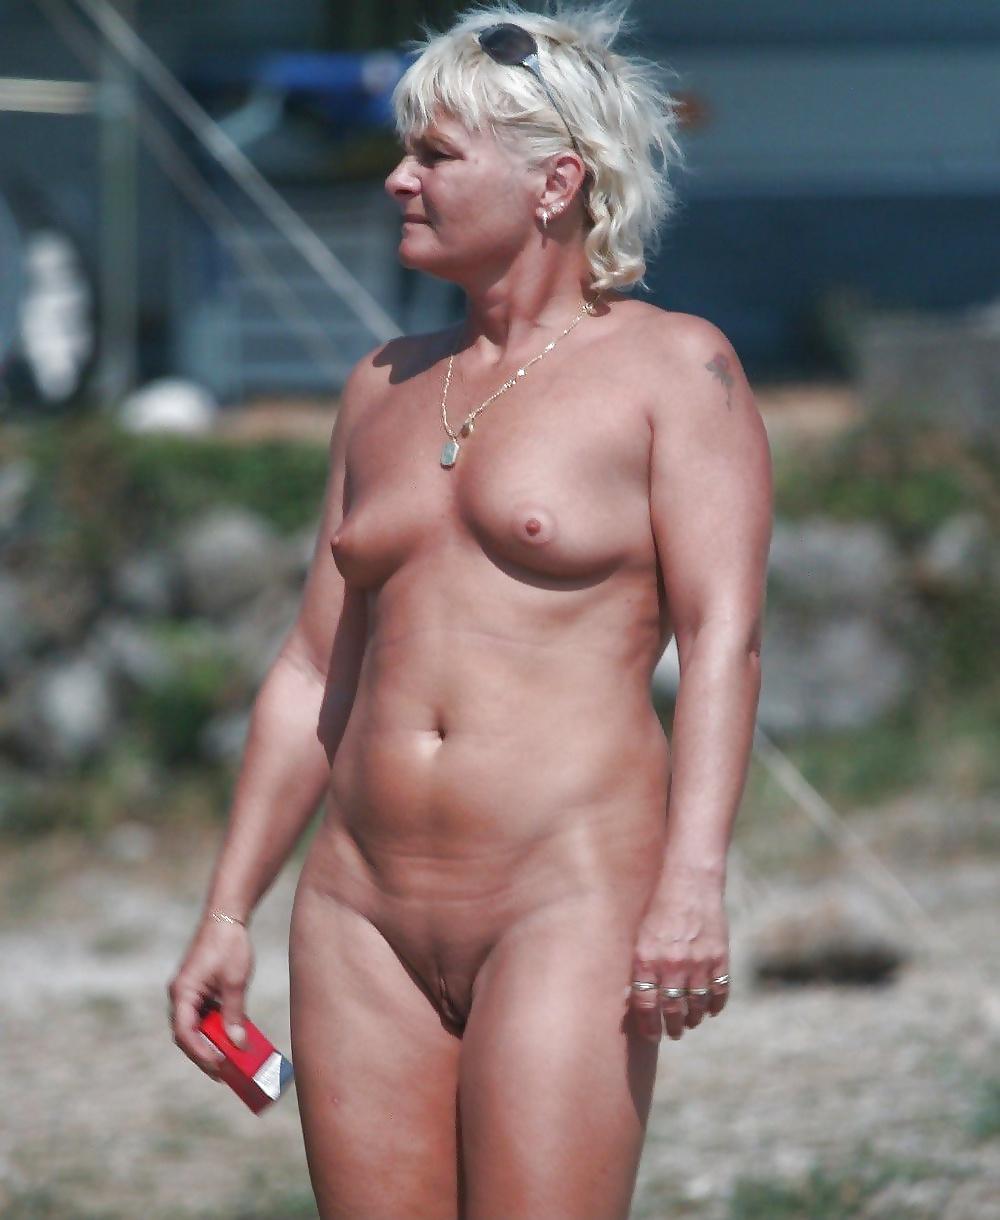 Hot older nudist #10